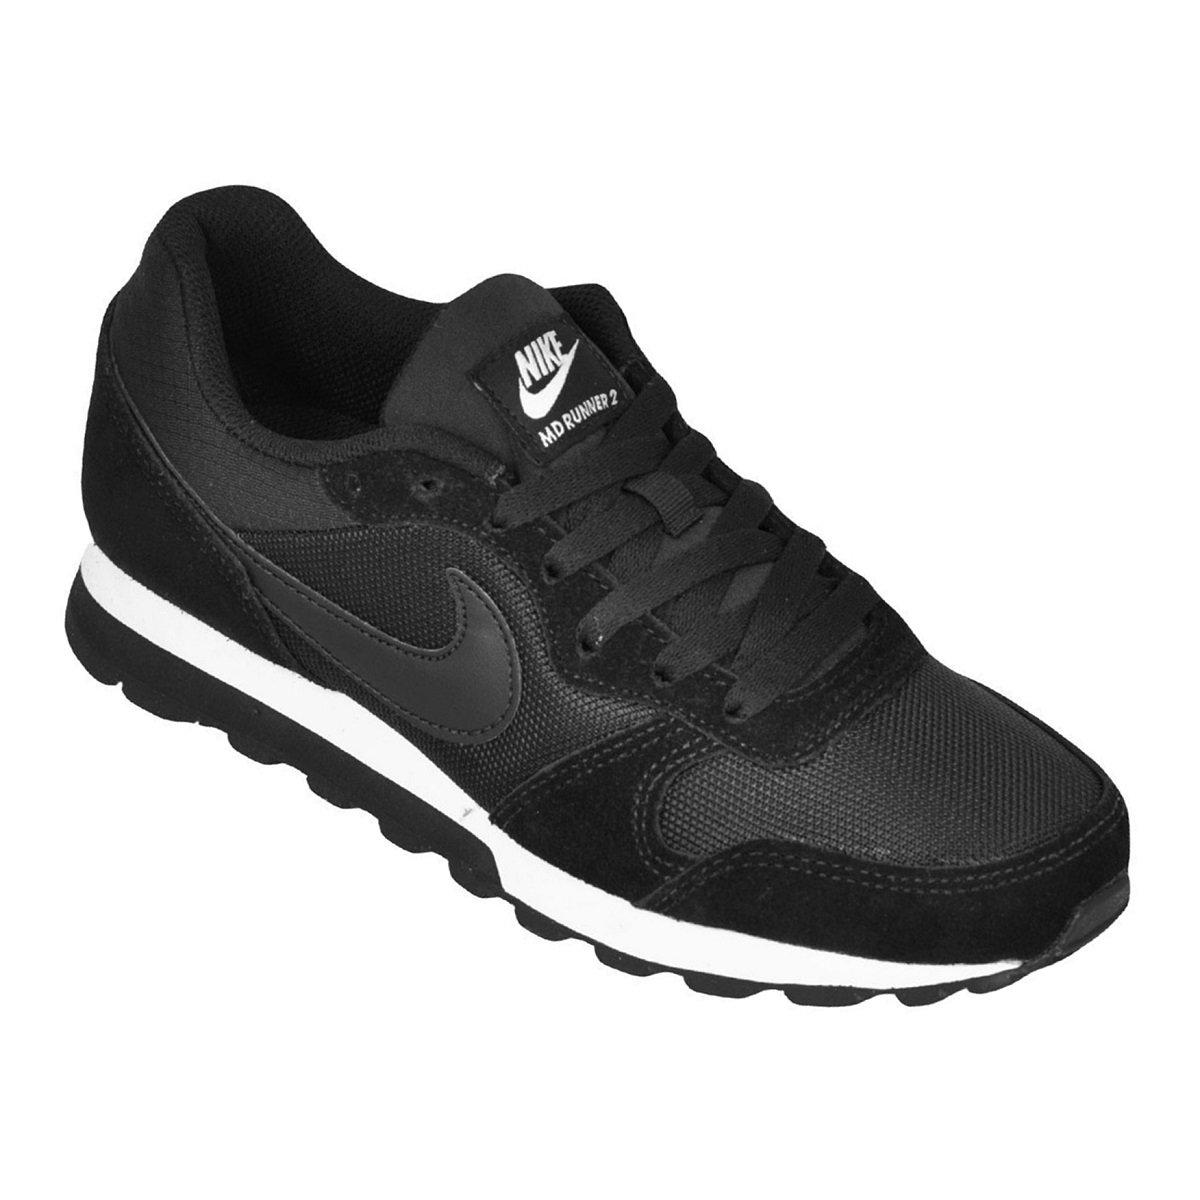 babb1d8e4bca2 Tênis Nike WMNS MD Runner 2 Feminino 749869-001 - Preto Branco ...